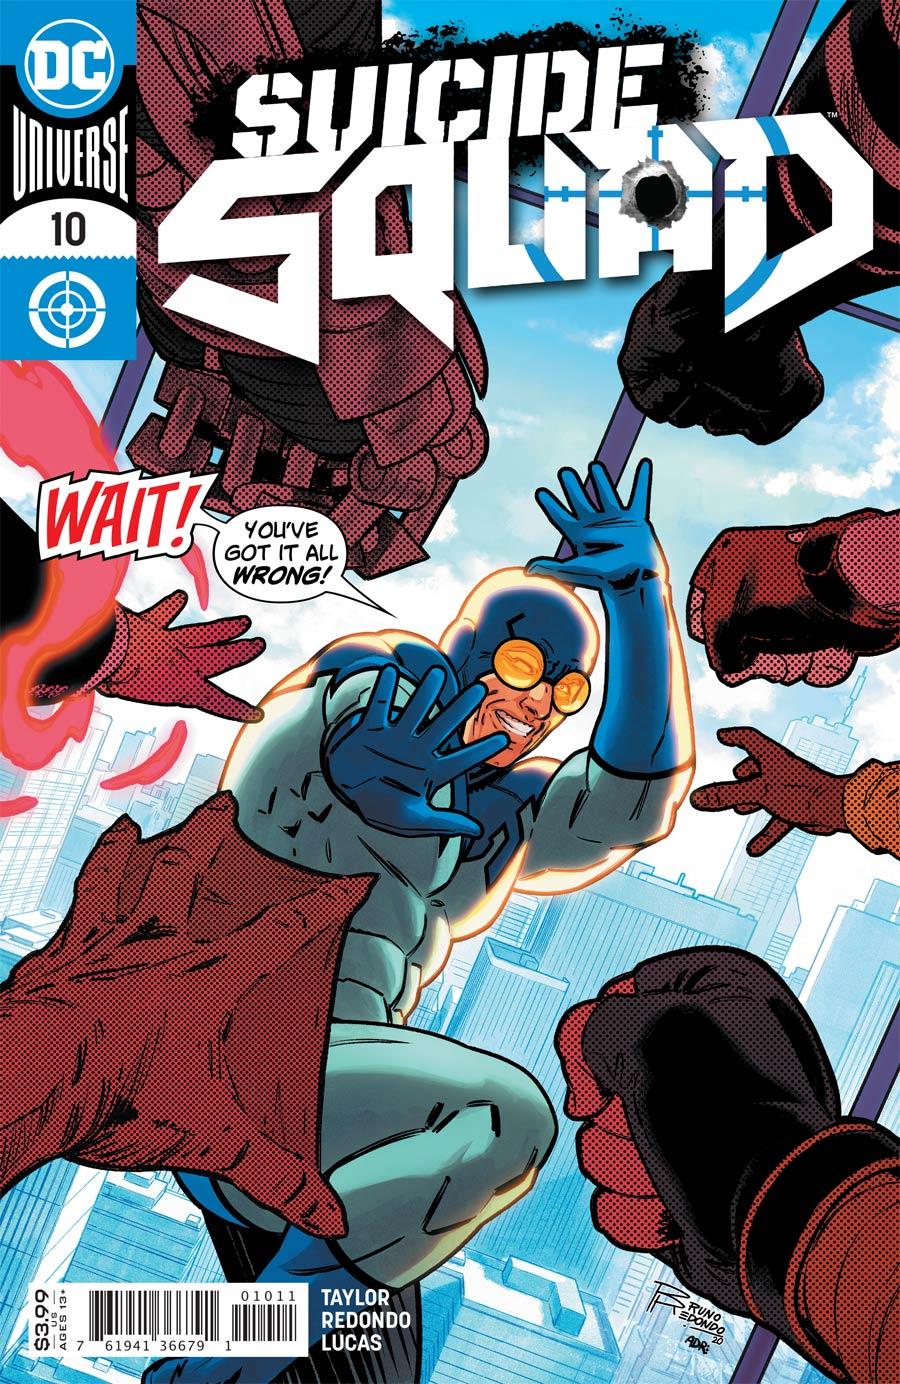 Suicide Squad Vol 5 #10 Cover A Regular Bruno Redondo Cover